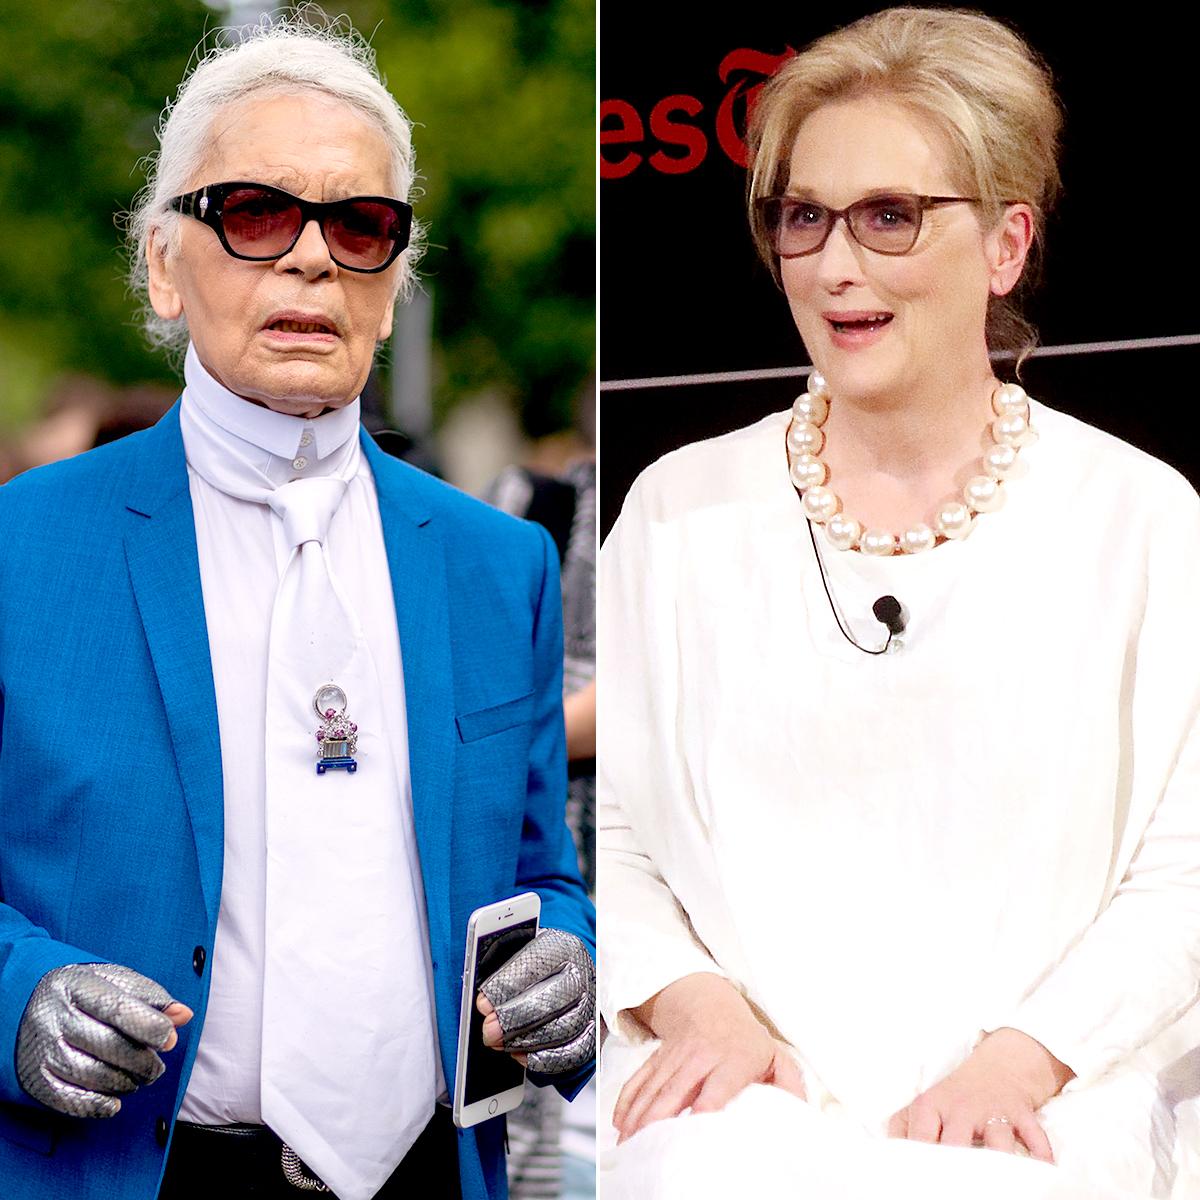 Karl Lagerfeld and Meryl Streep